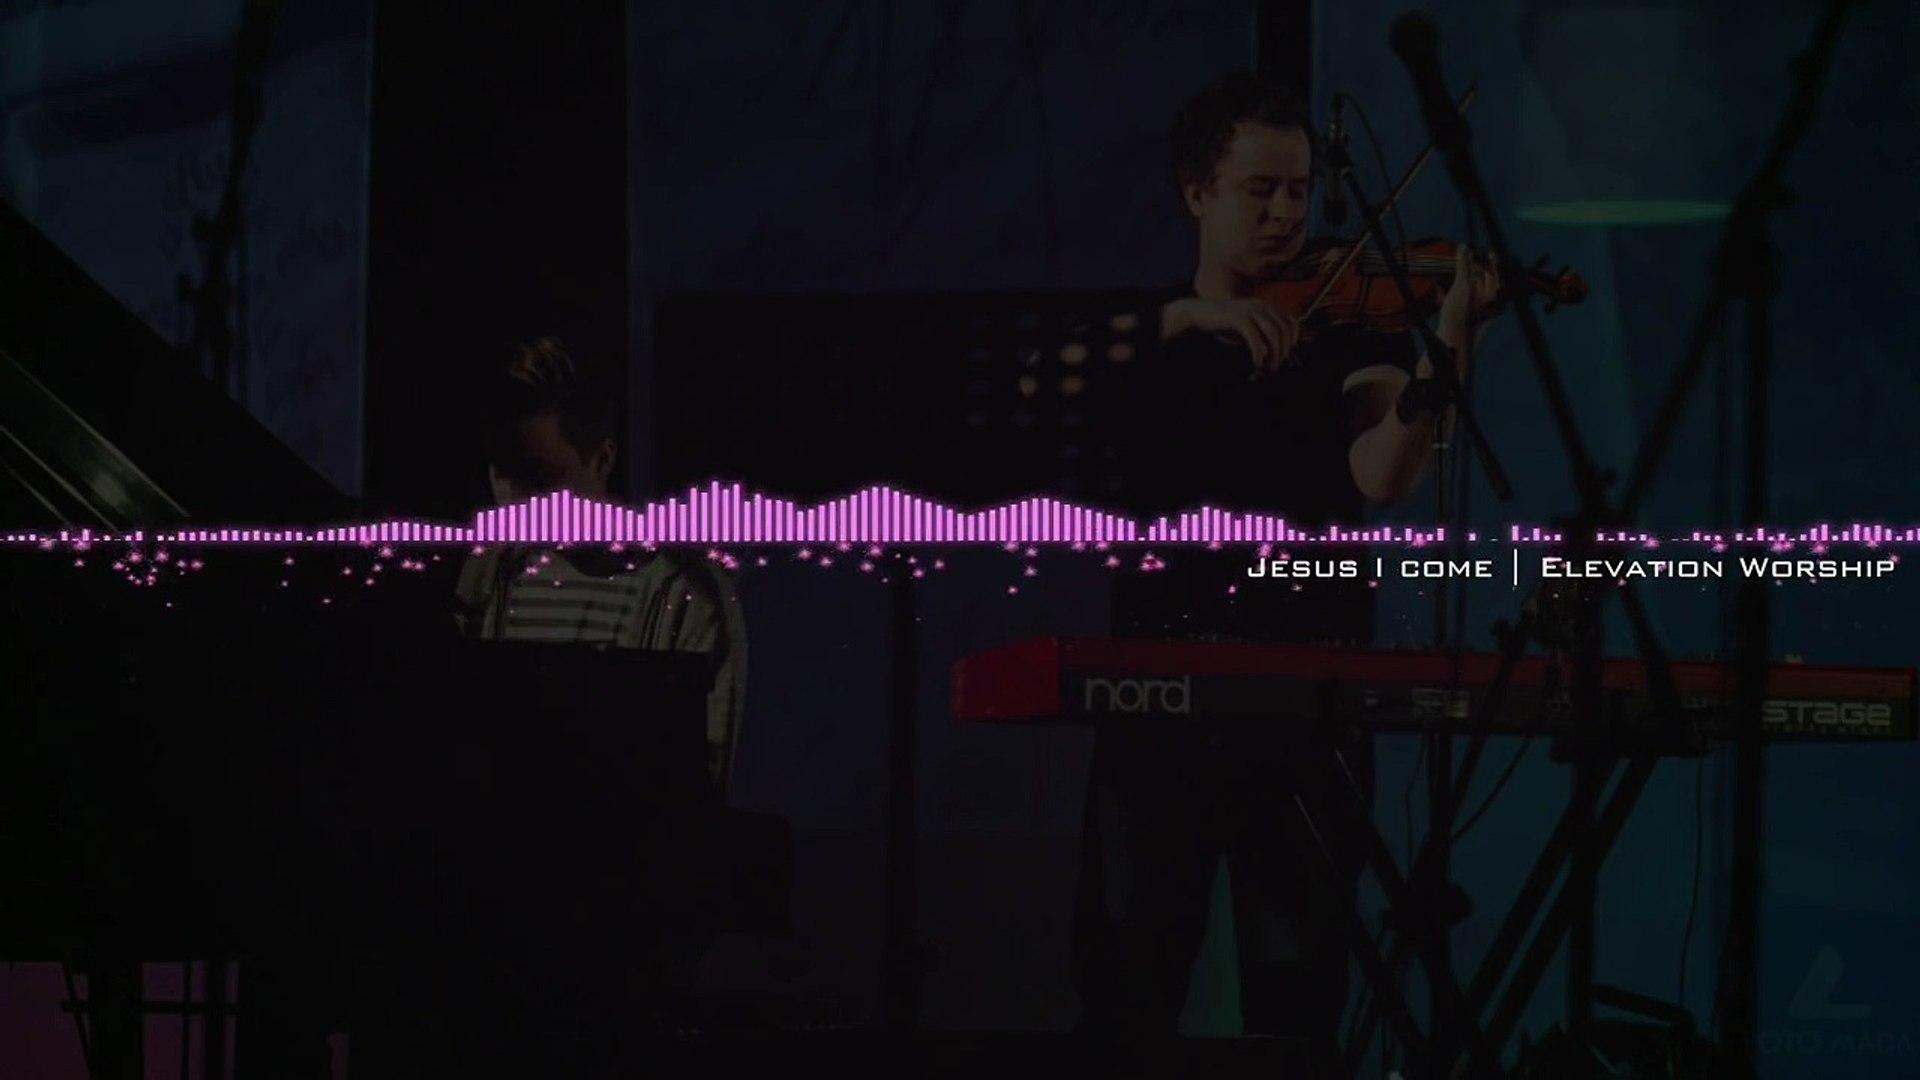 Jesus I come - Elevation Worship - instrumental piano & violin